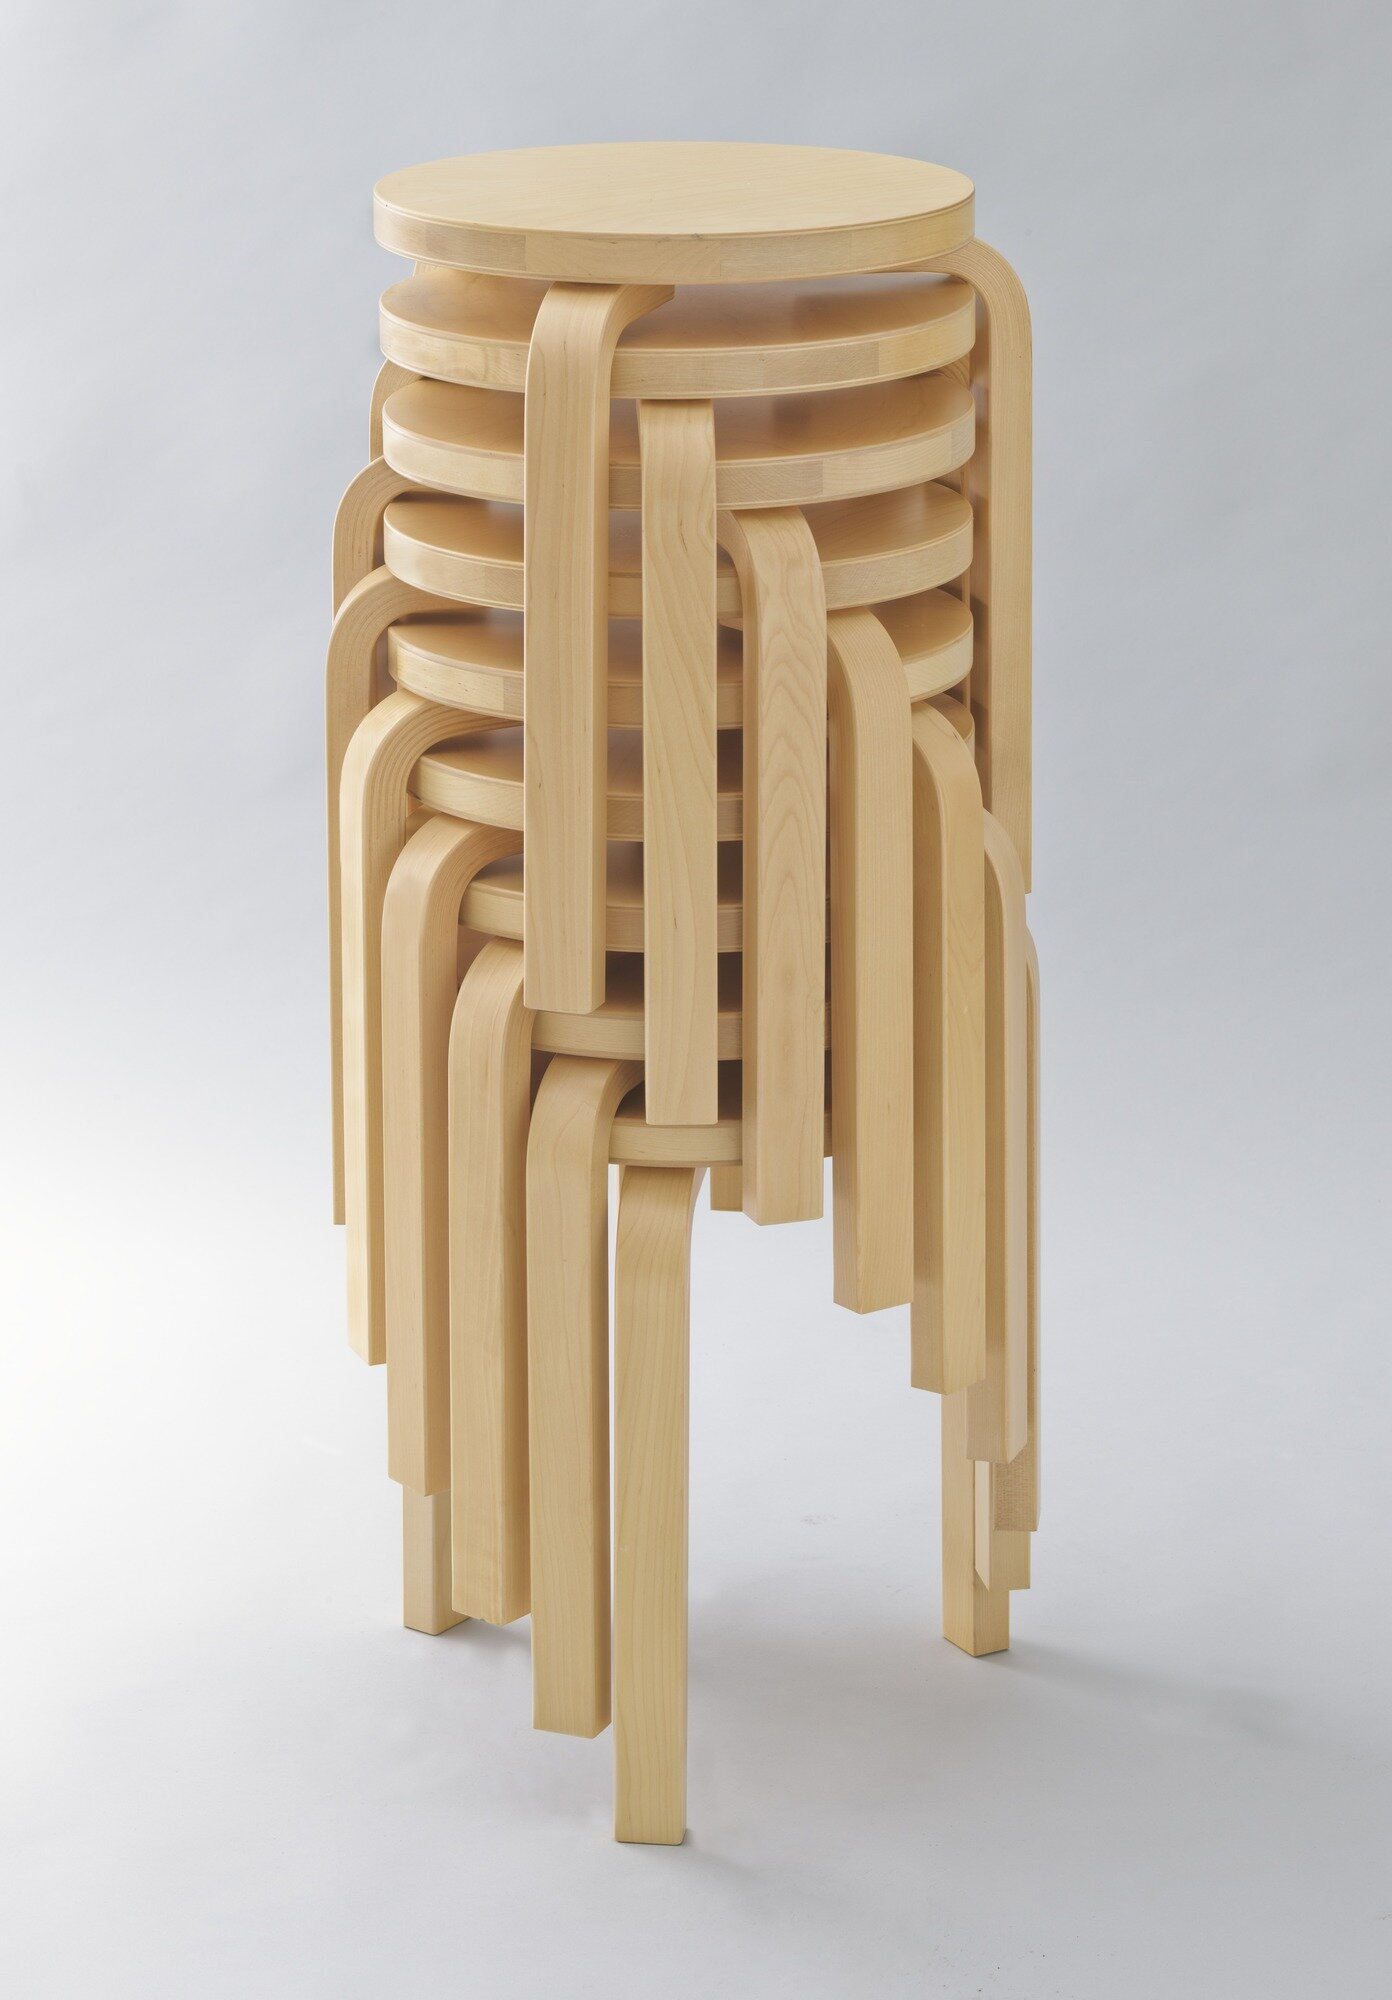 Stacking Stools-model 60 (1932-1933)